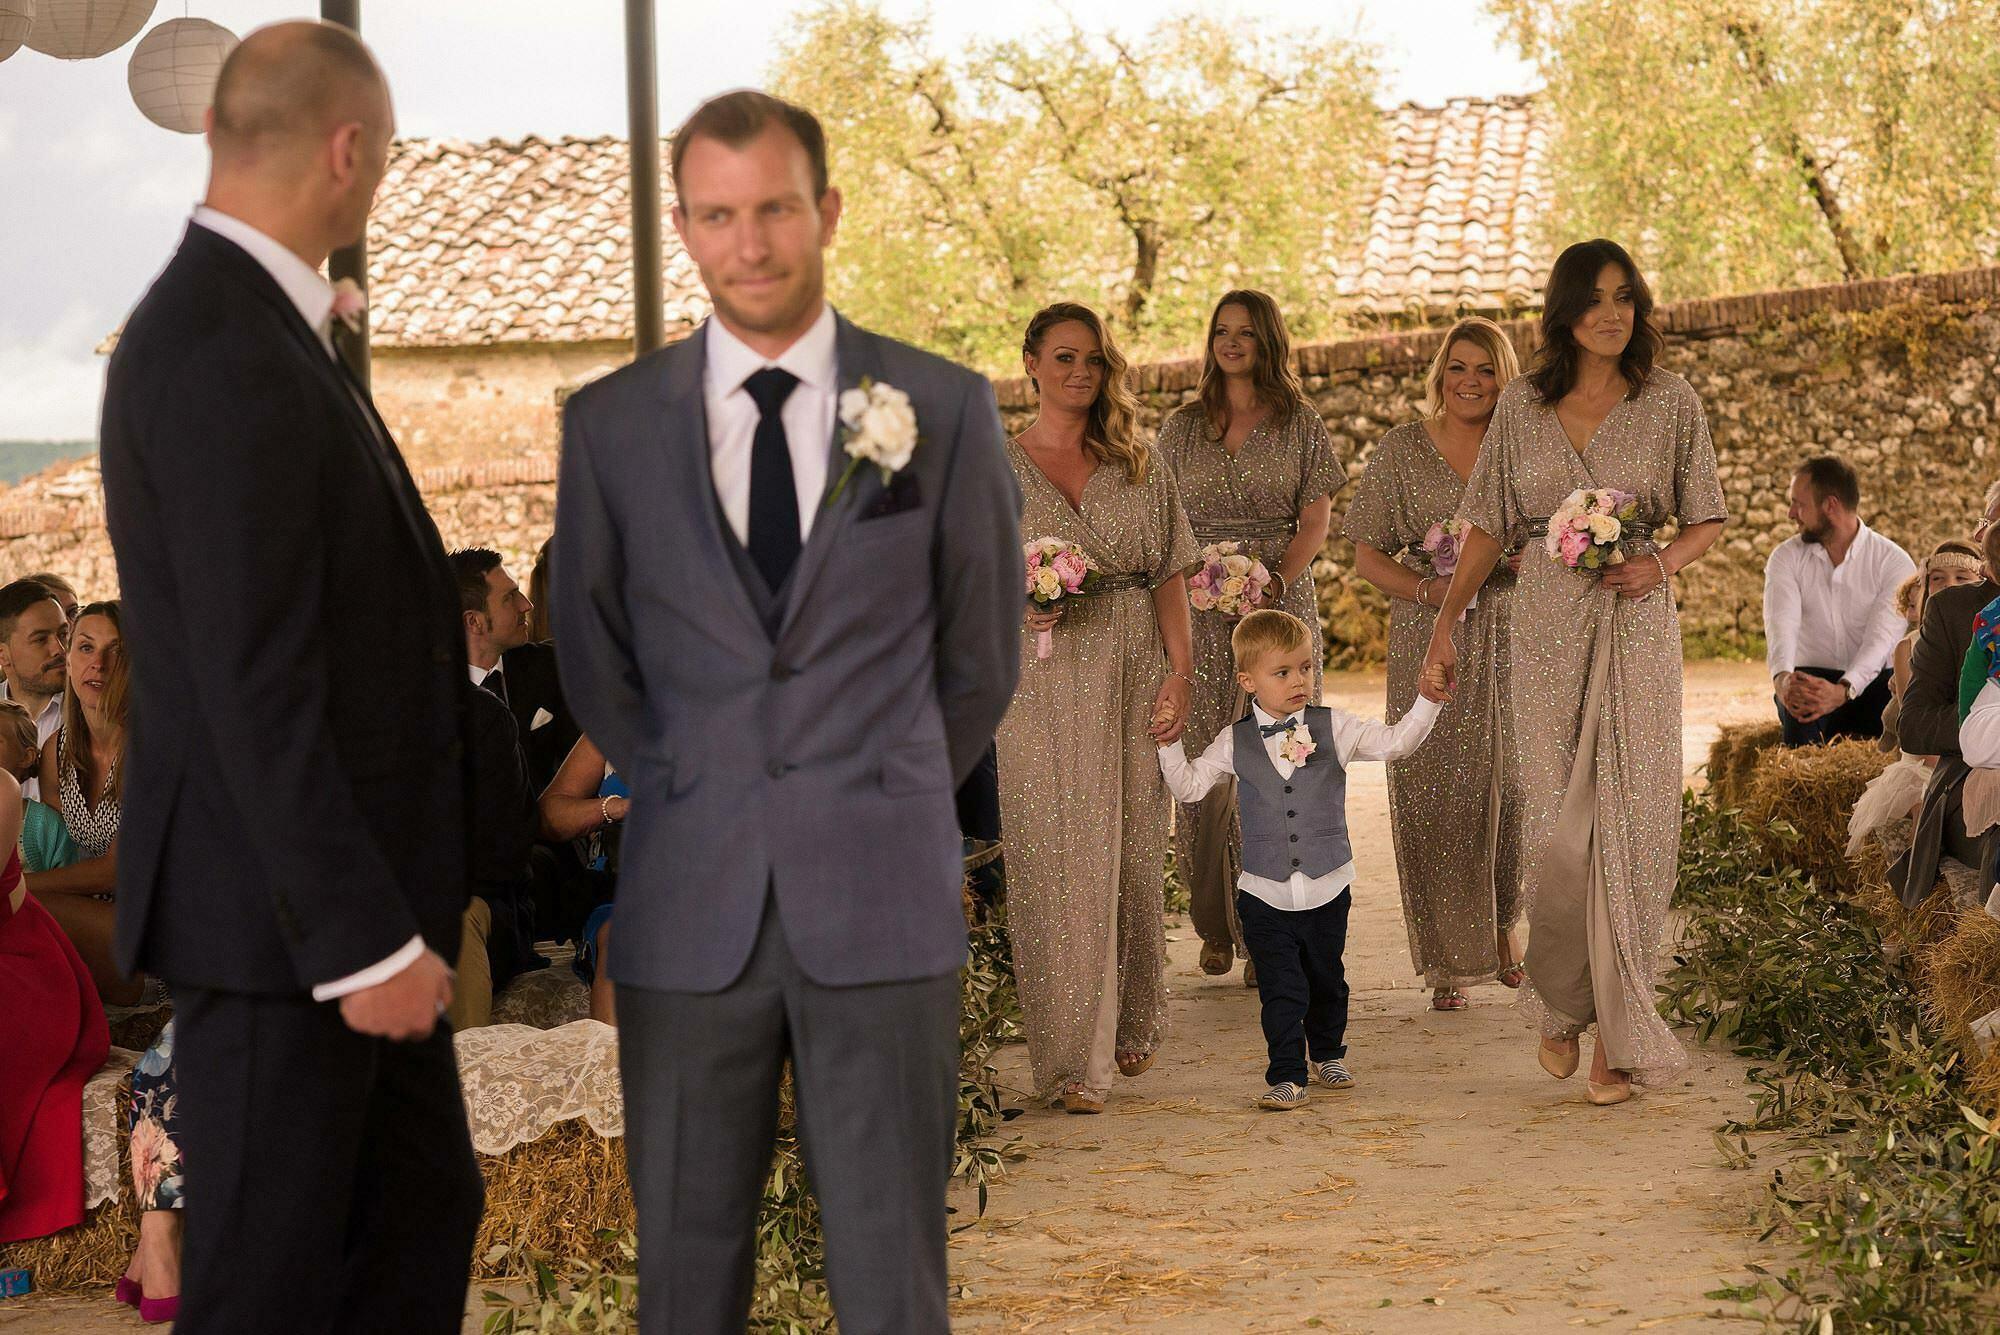 bridesmaids walking down aisle in Tuscany